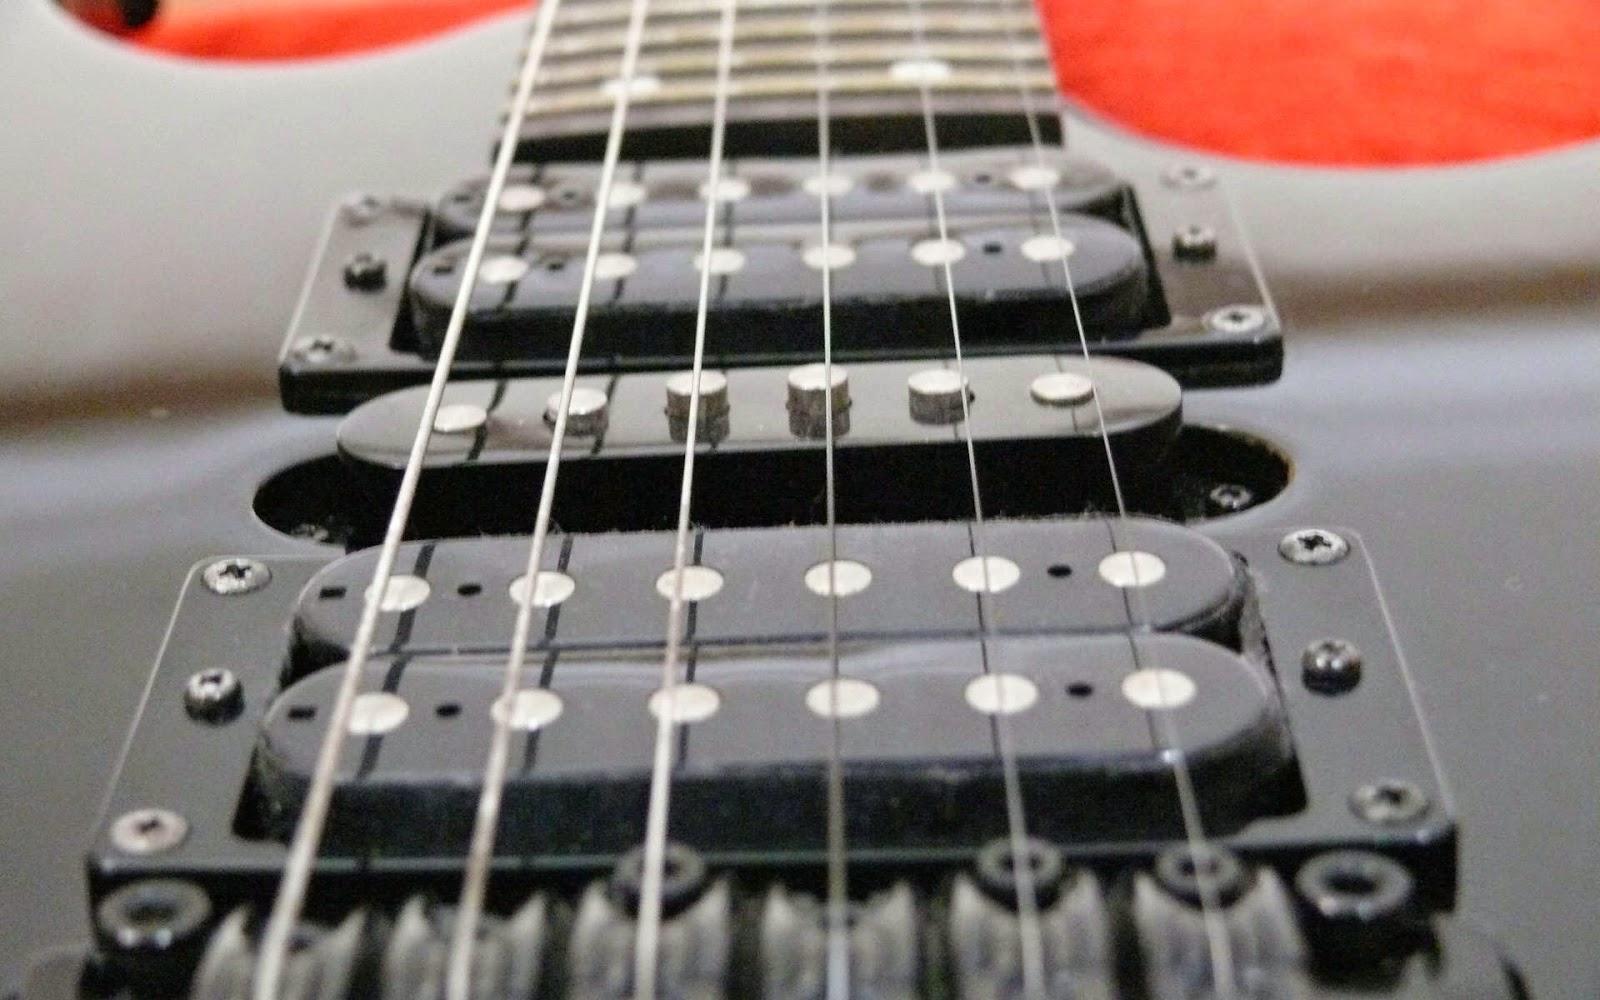 ibanez bass guitar wallpaperon - photo #10